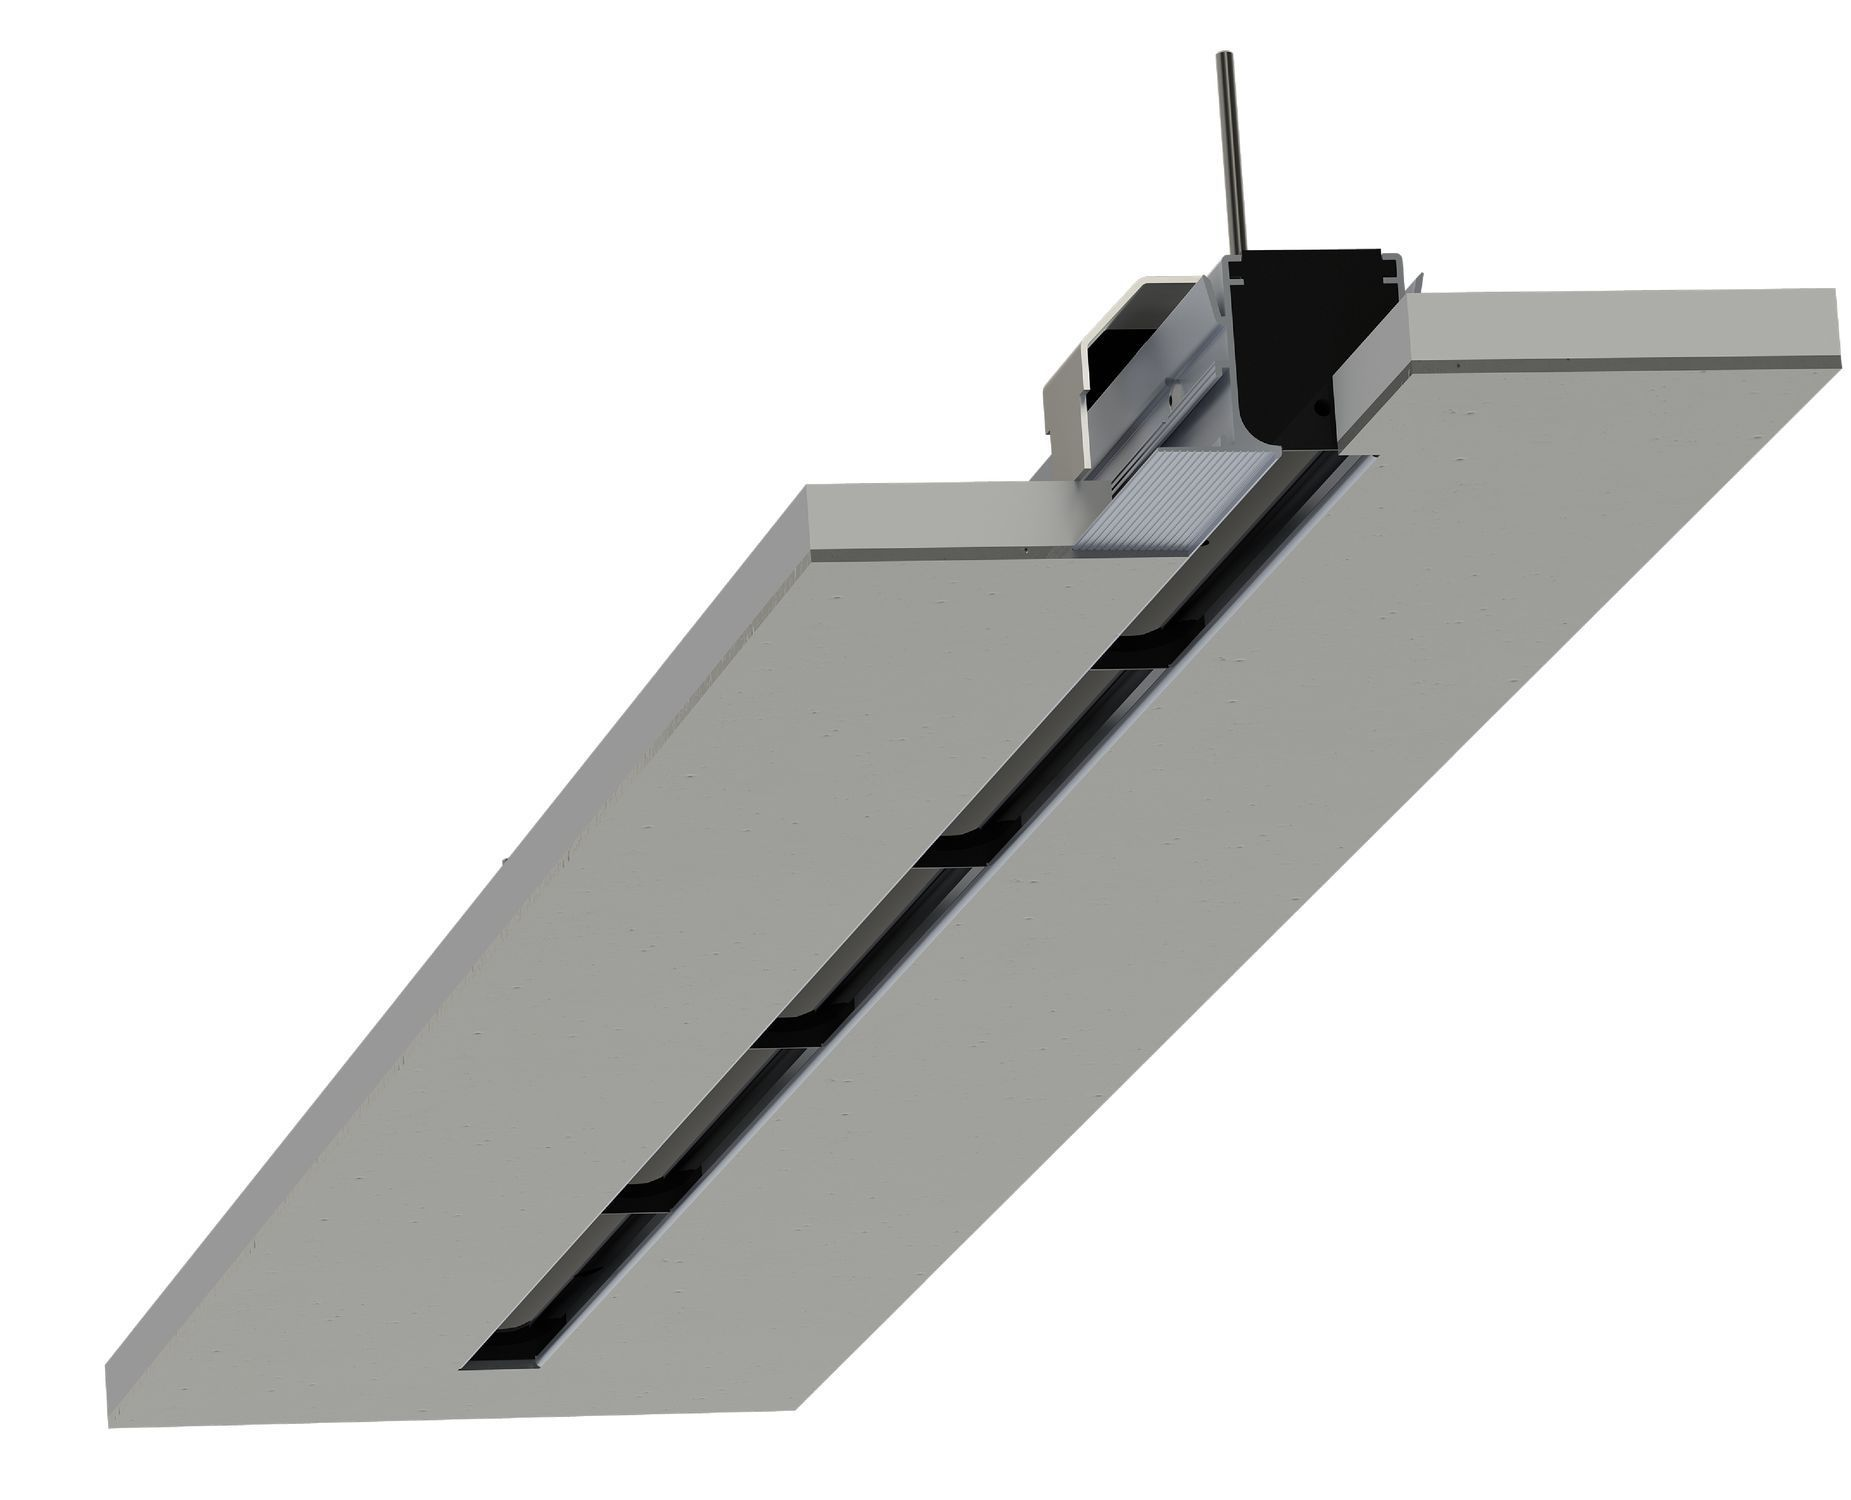 Linear Slot Diffuser 4 : Ceiling air diffuser linear slot dsc plaster schako